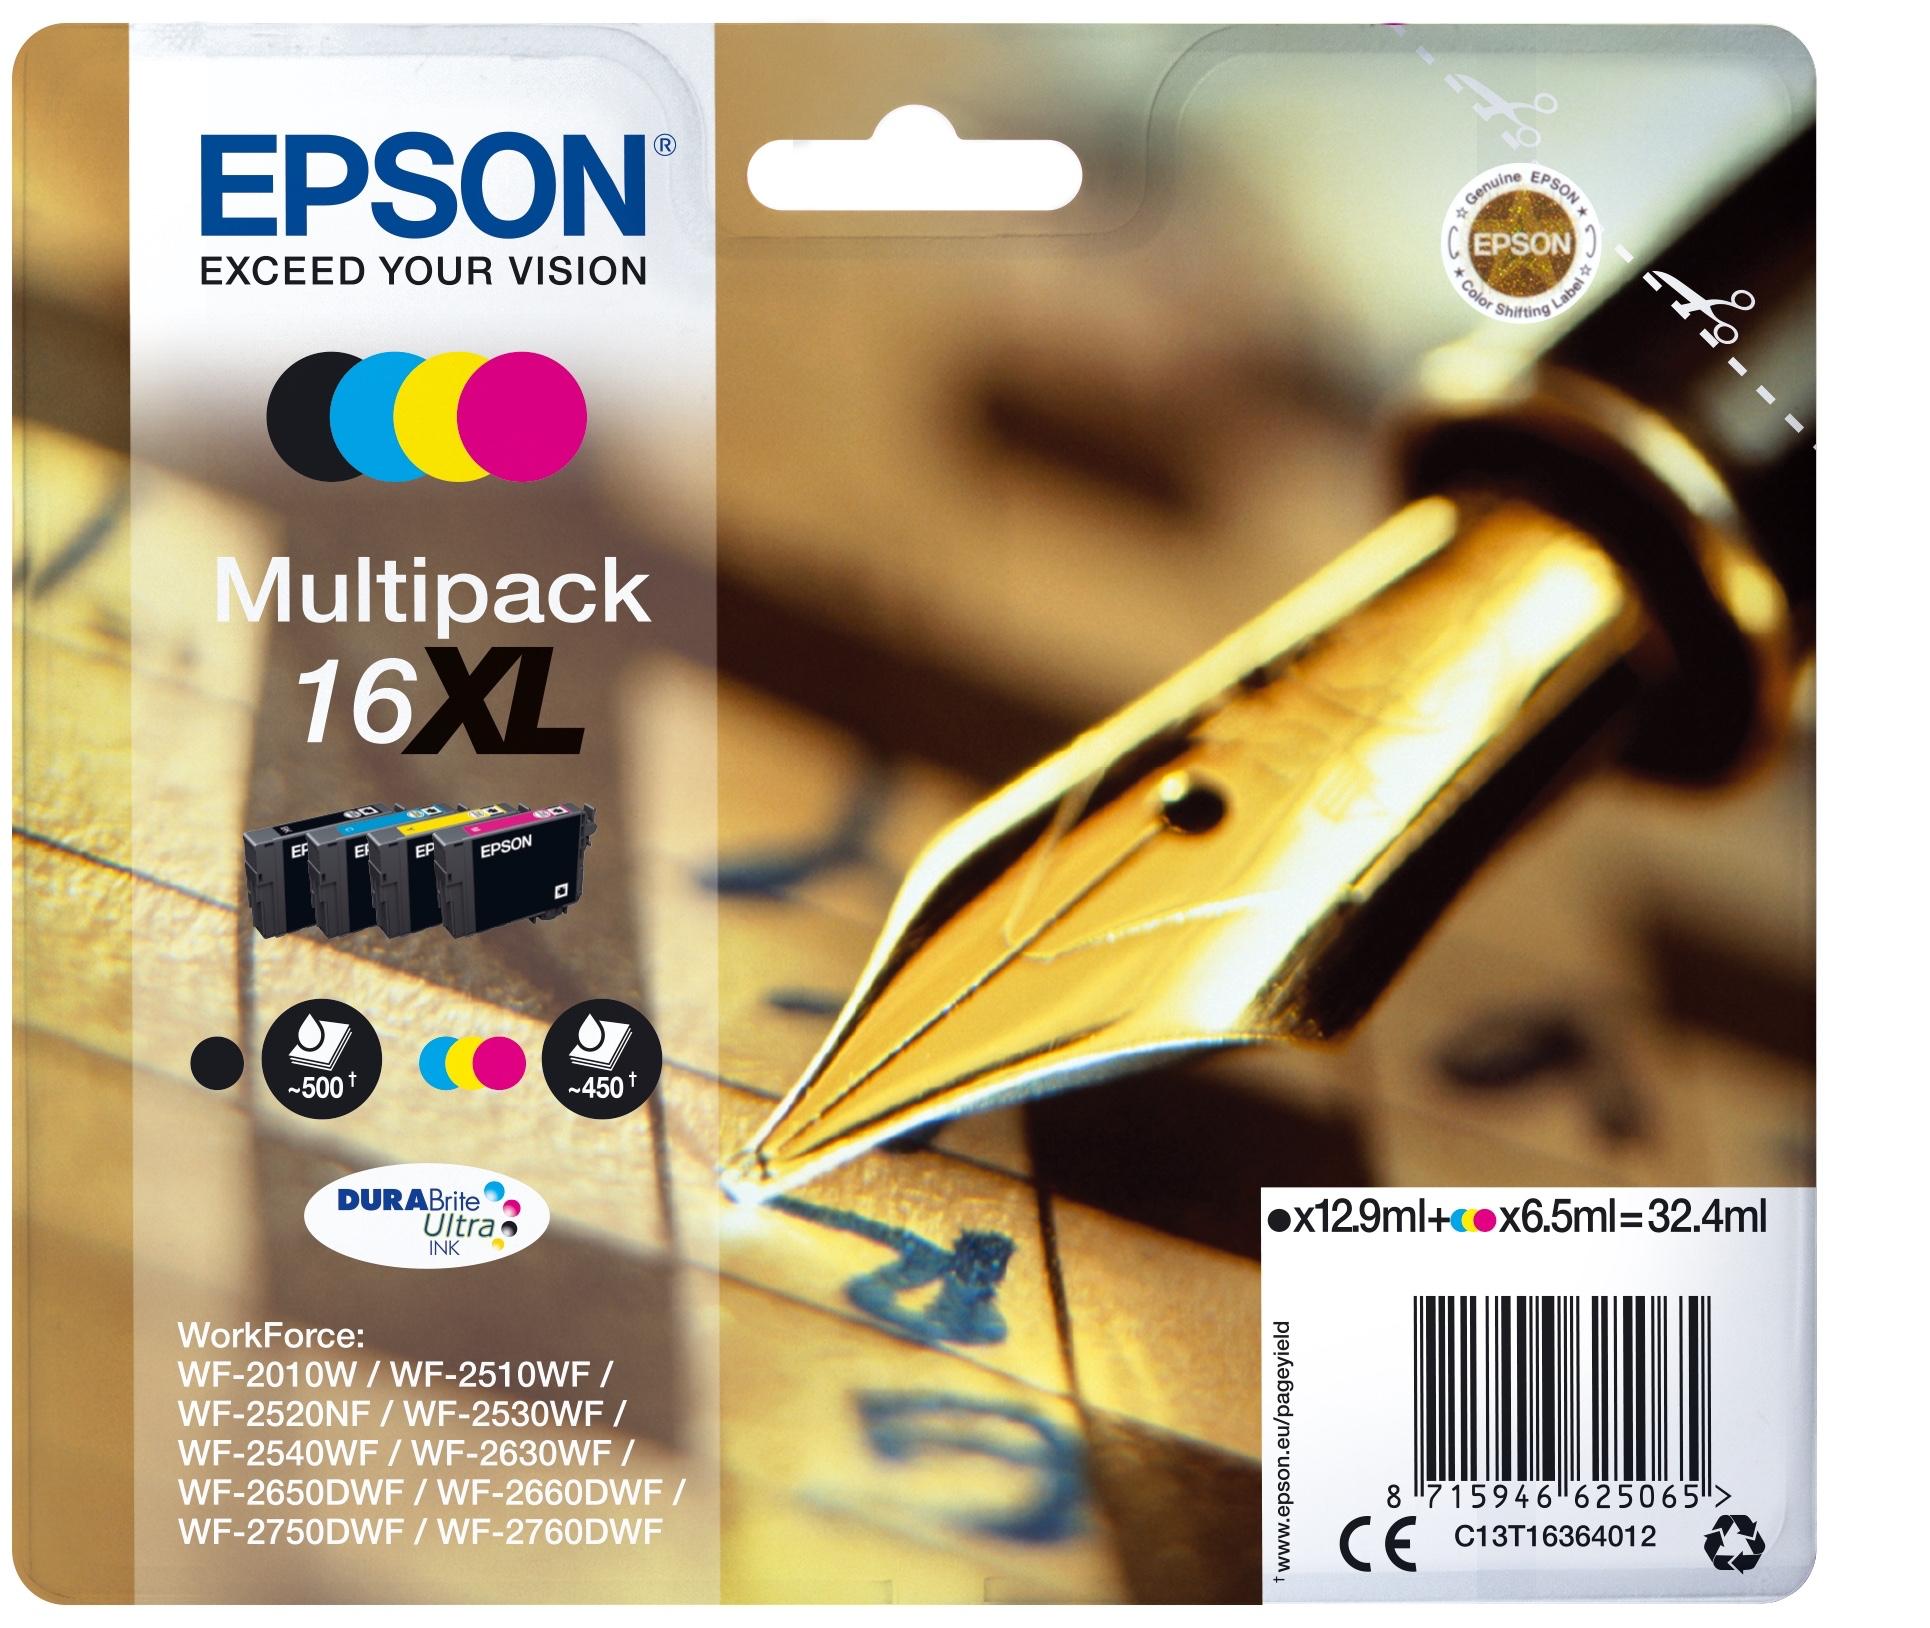 Epson Pen and crossword Multipack Penna e cruciverba 4 colori Inchiostri DURABrite Ultra 16XL